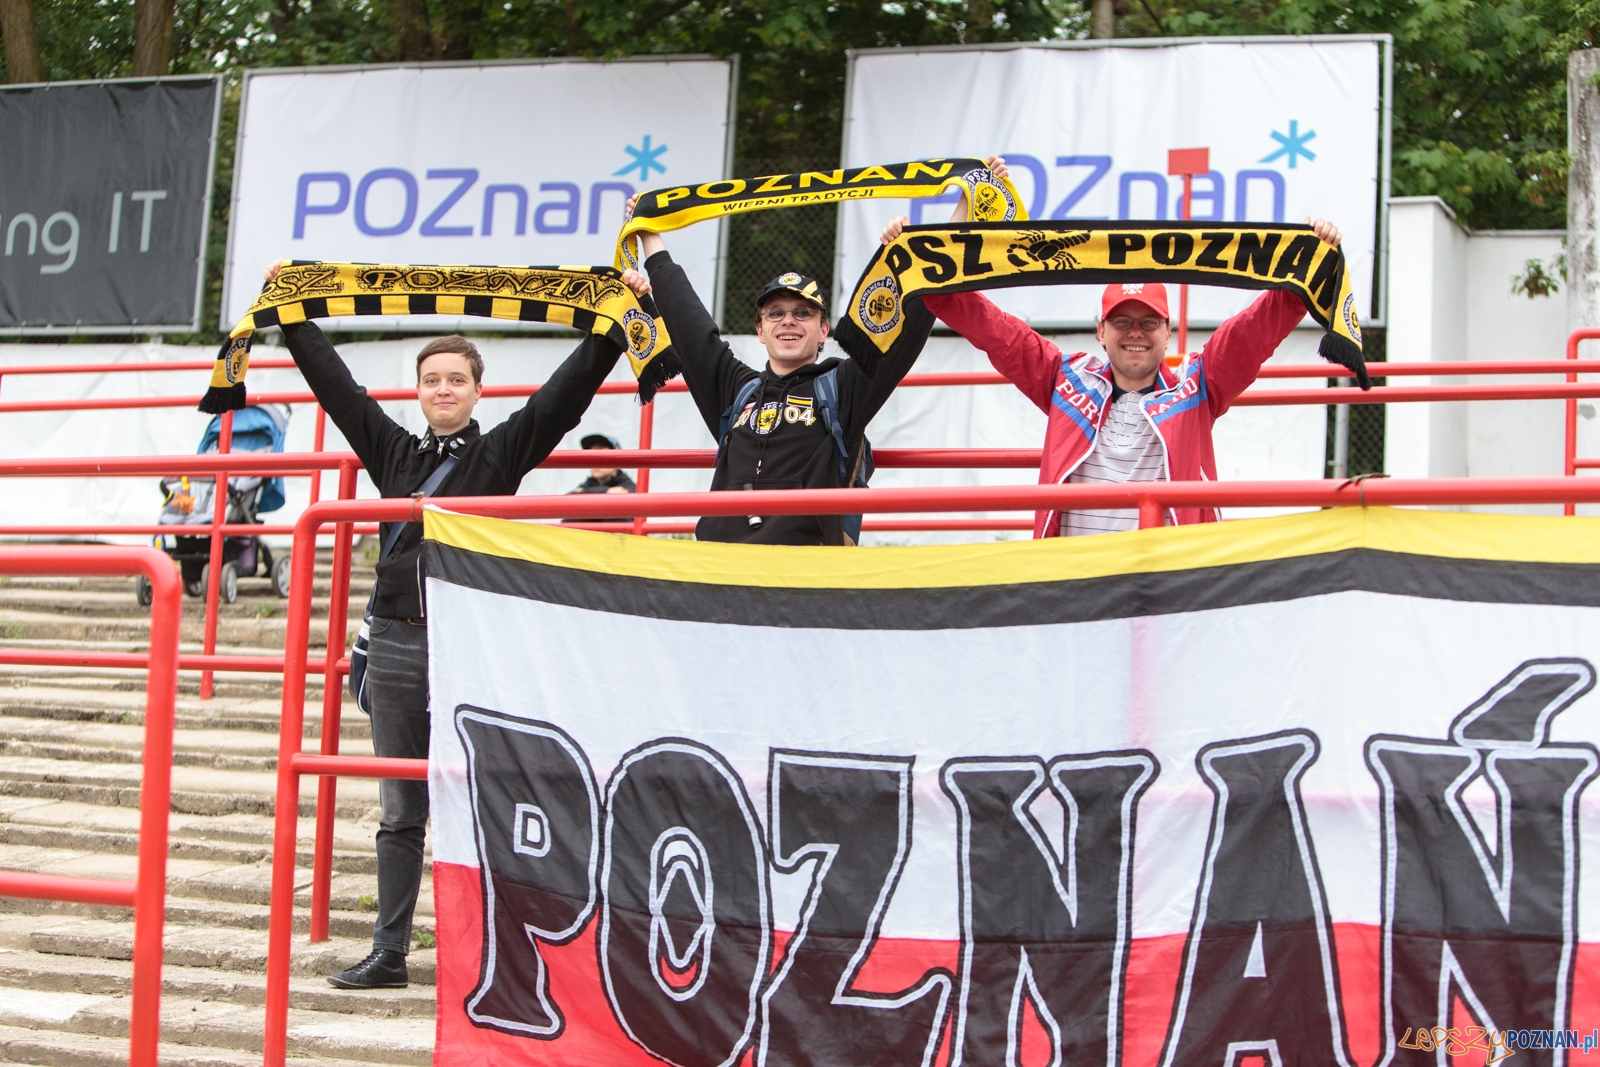 Naturalna Medycyna PSŻ Poznań - Stal-Met Kolejarz Opole 47:43  Foto: LepszyPOZNAN.pl / Paweł Rychter